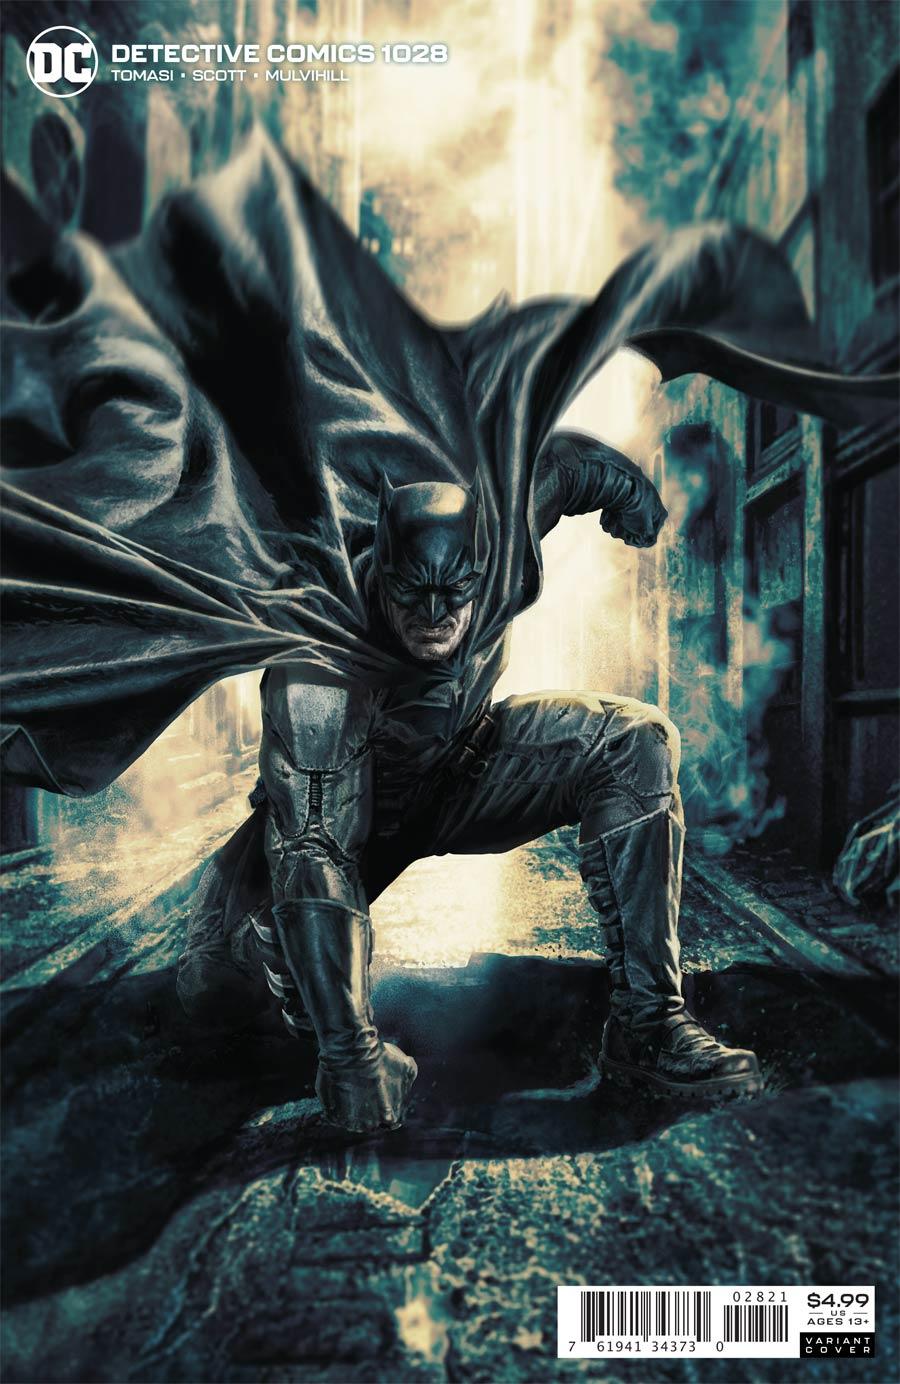 Detective Comics Vol 2 #1028 Cover B Variant Lee Bermejo Card Stock Cover (Joker War Fallout Tie-In)